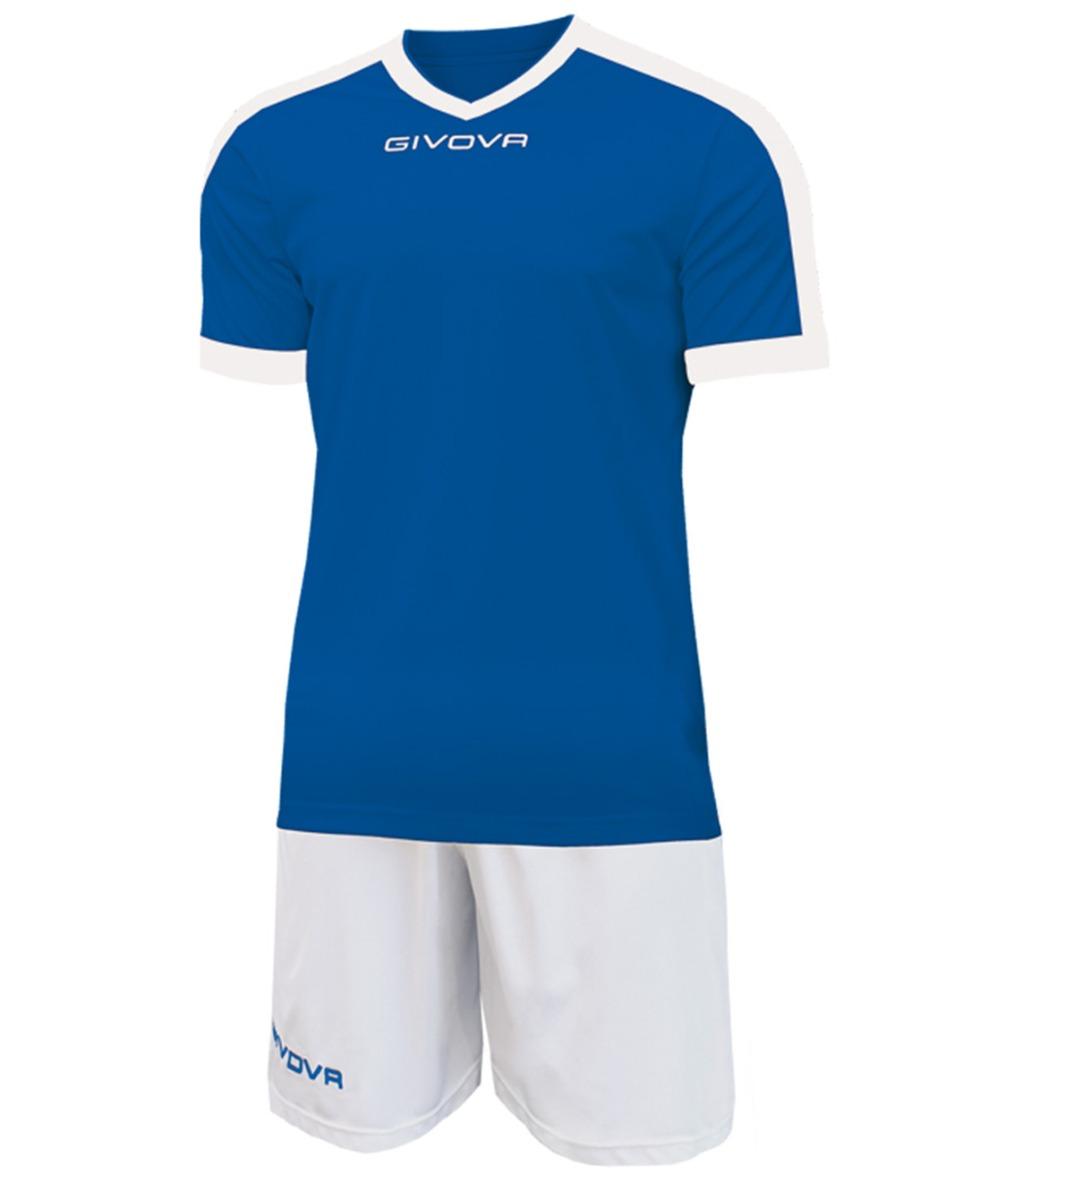 Details Zu Kit Revolution Fussball Sport Givova Kleidung Sport Herren Fussball Giosal